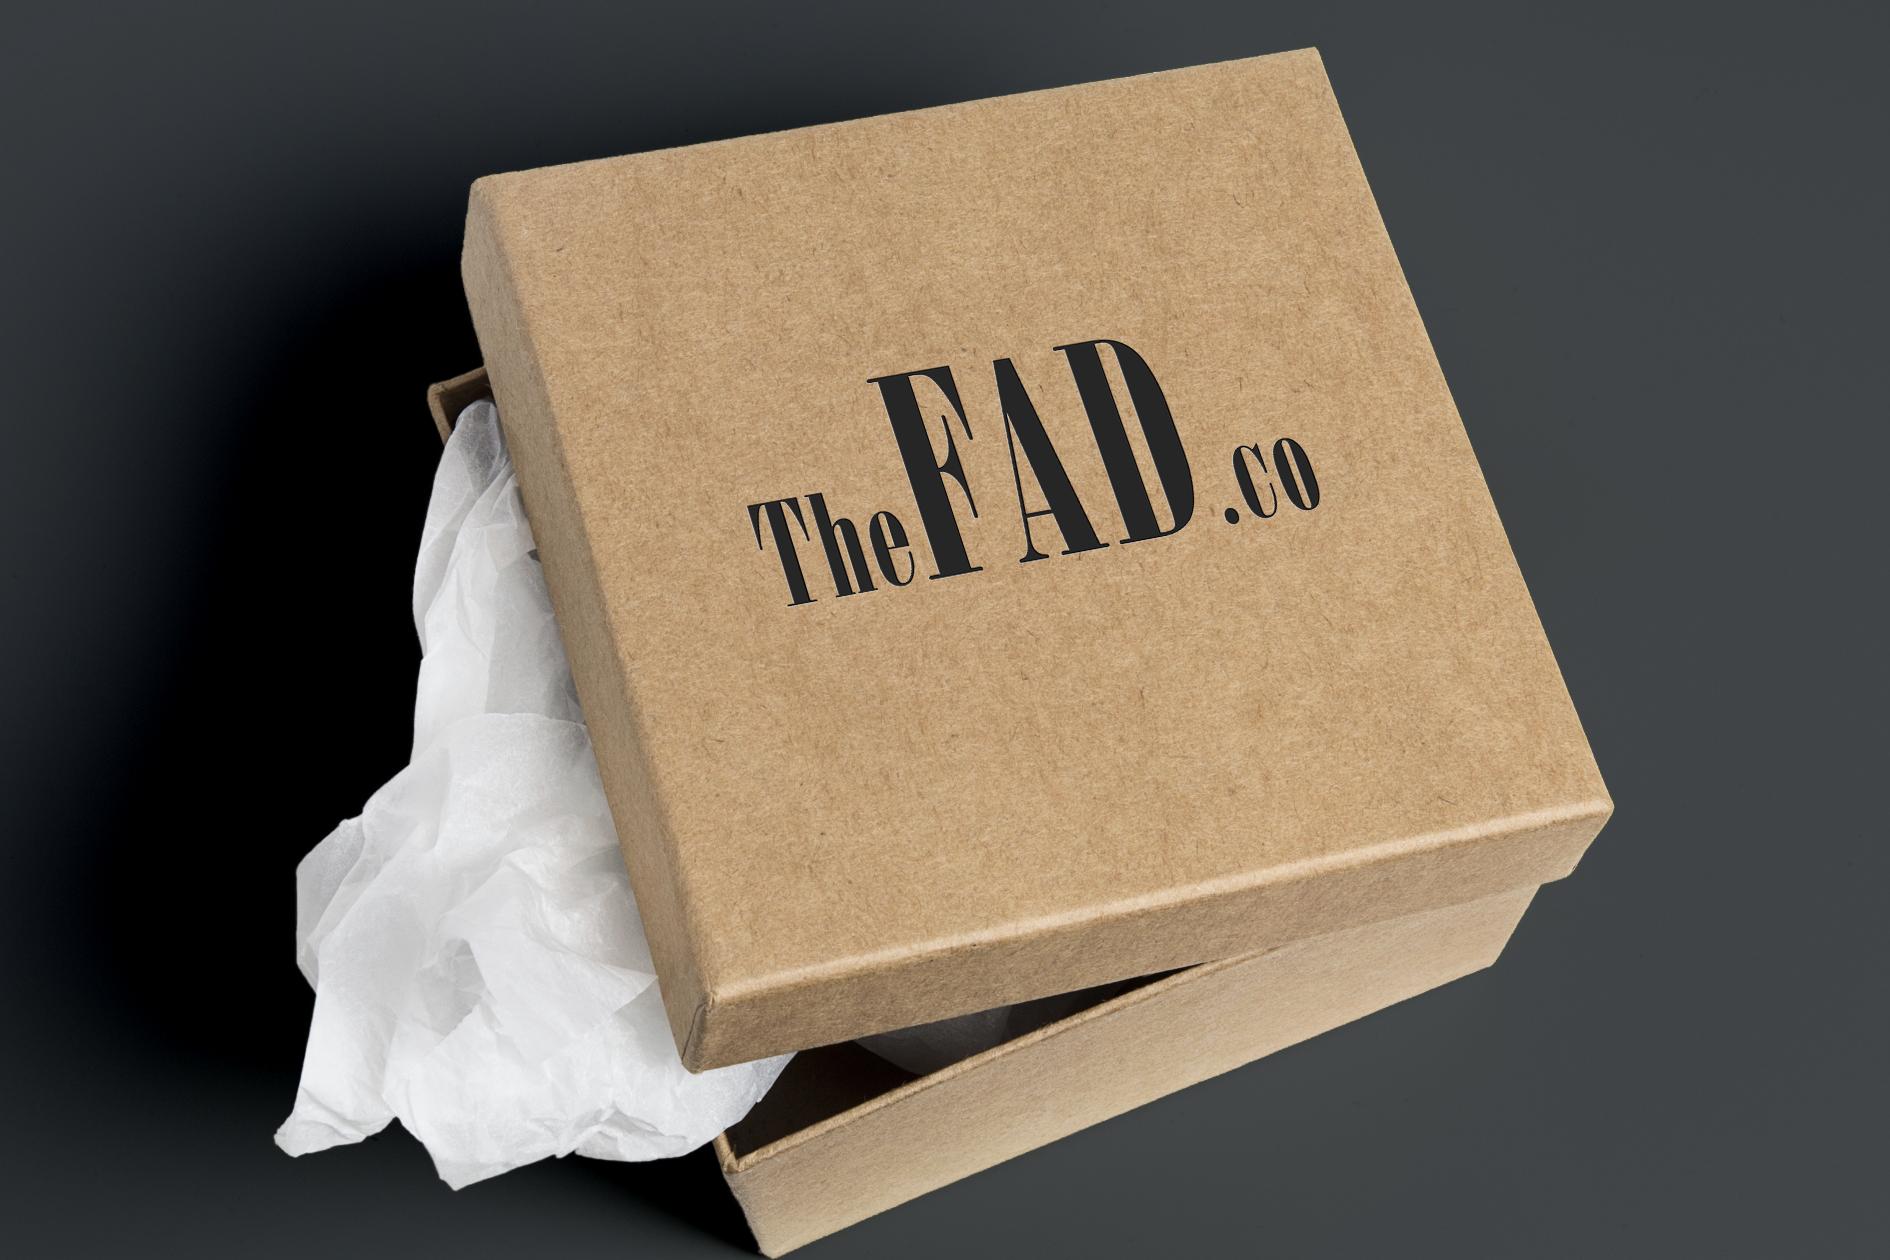 thefad-co-gift-box